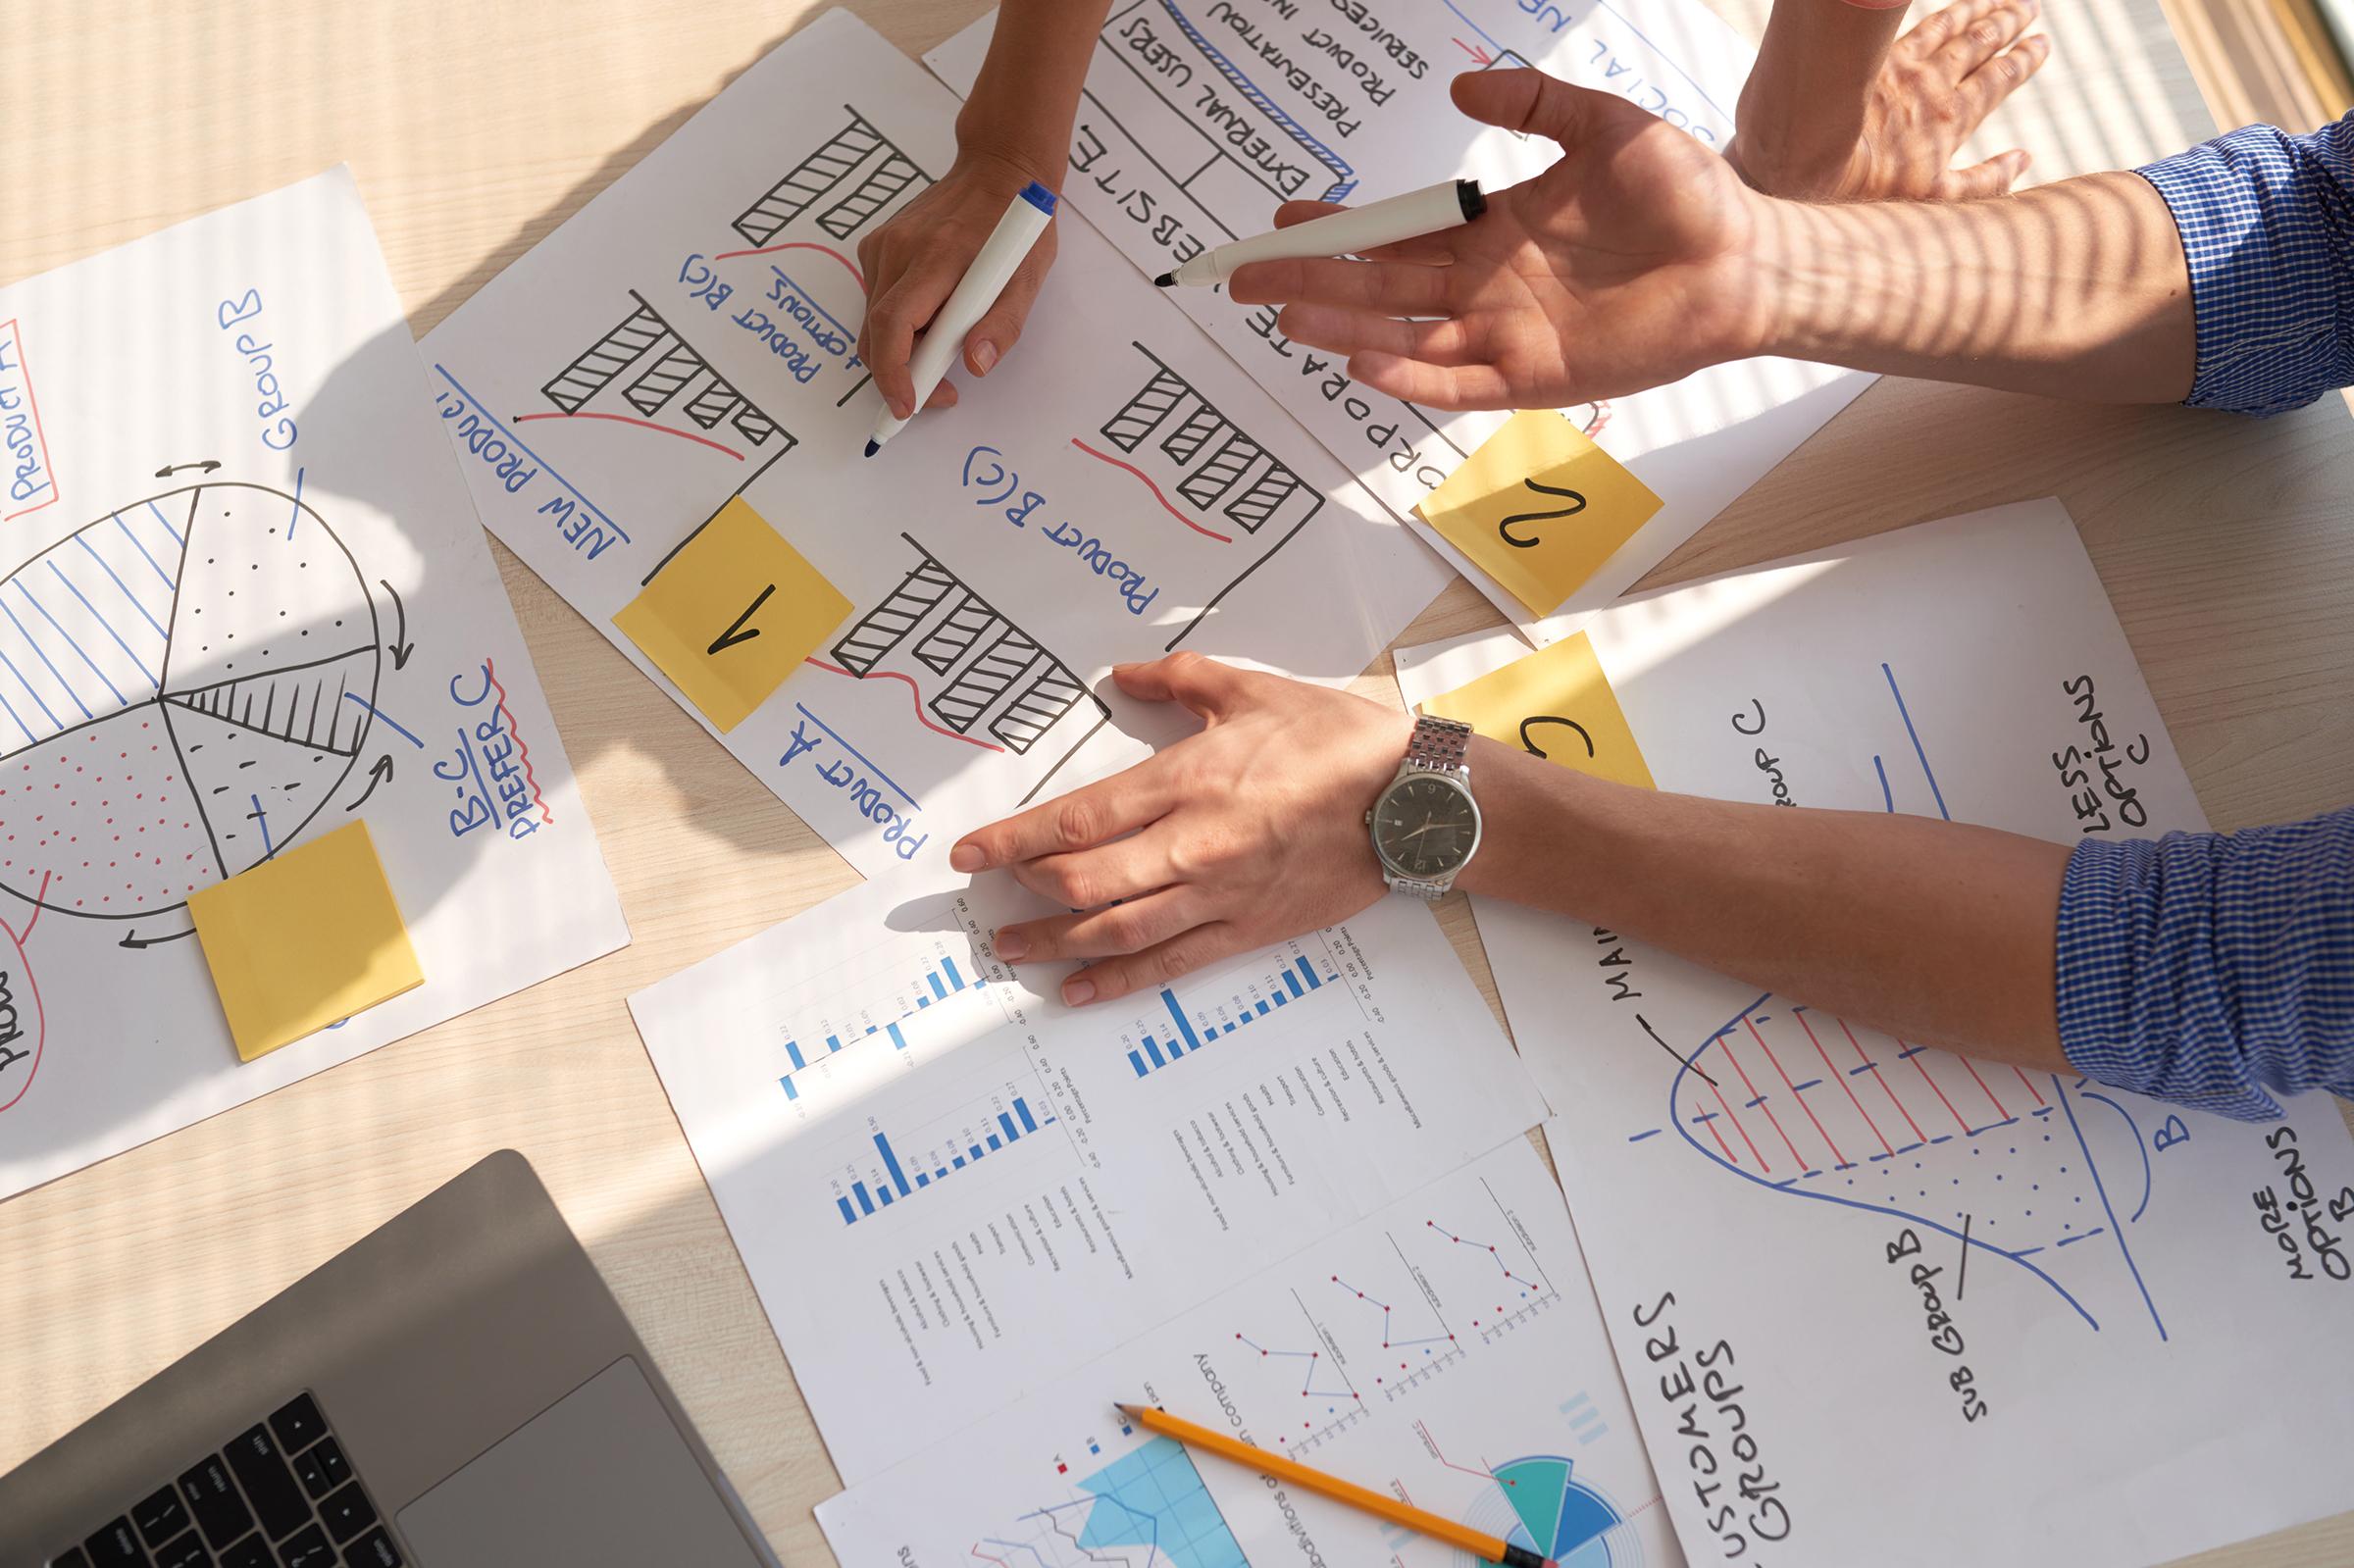 equipo-marketing-fulcri-manos-graficos